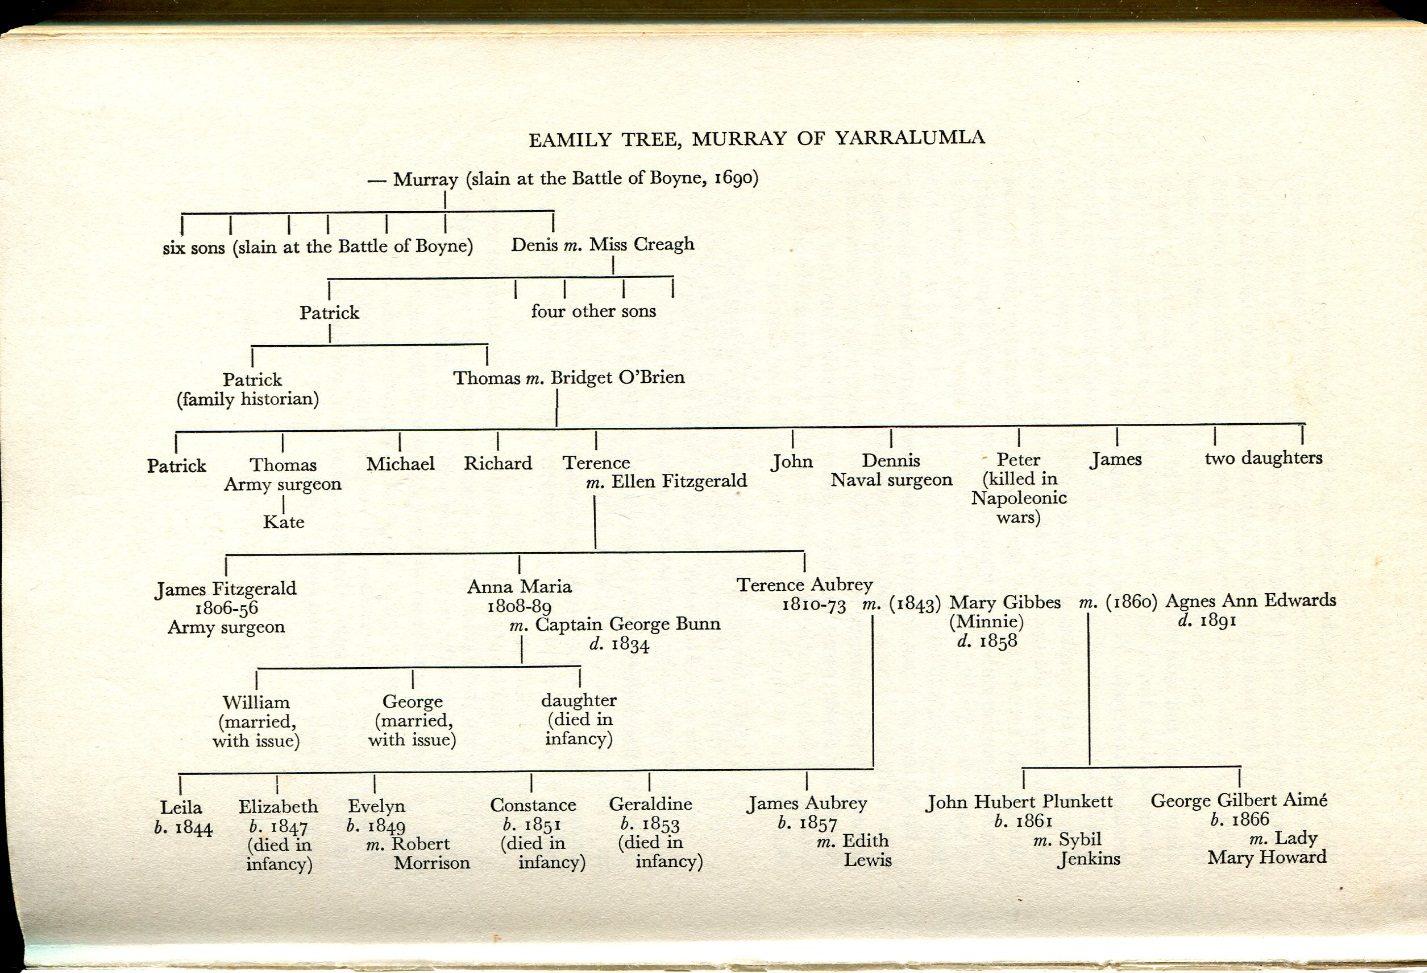 C:\Users\Virginia Rundle\Documents\Ancestry\Murray\Murray Family treeimg044.jpg